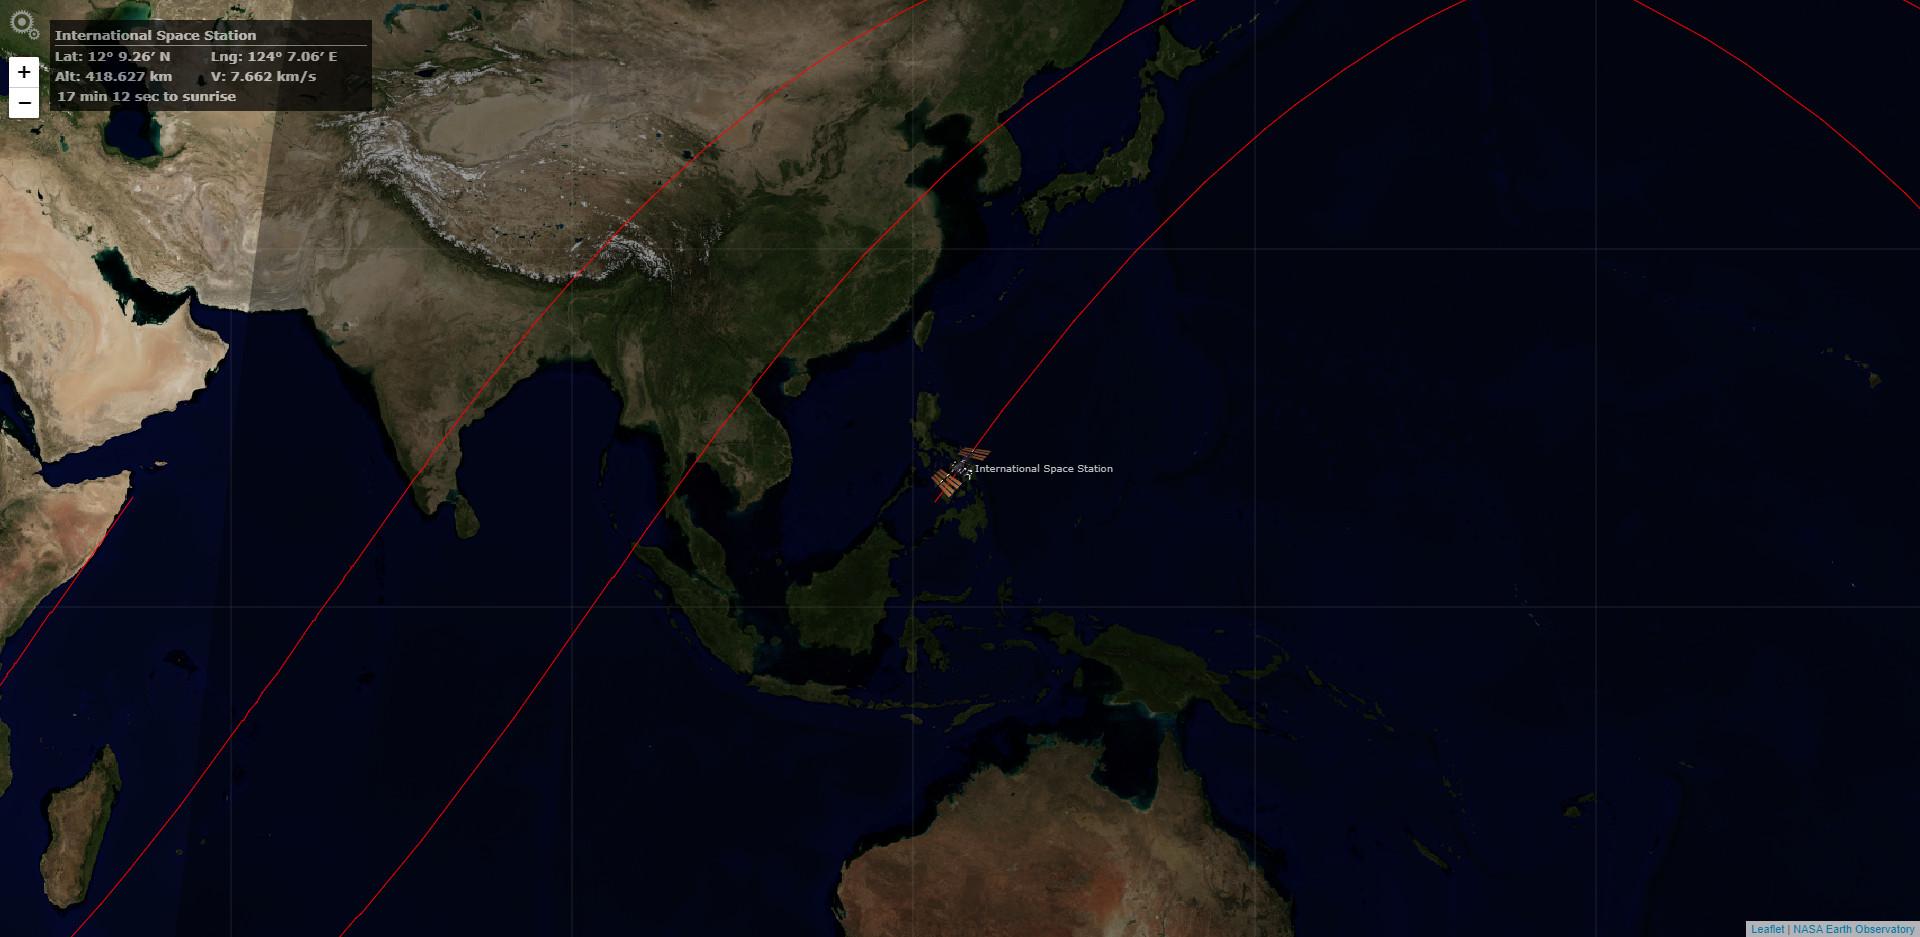 OrbTrack ISSの現在位置 (2020.09.05 23:04)